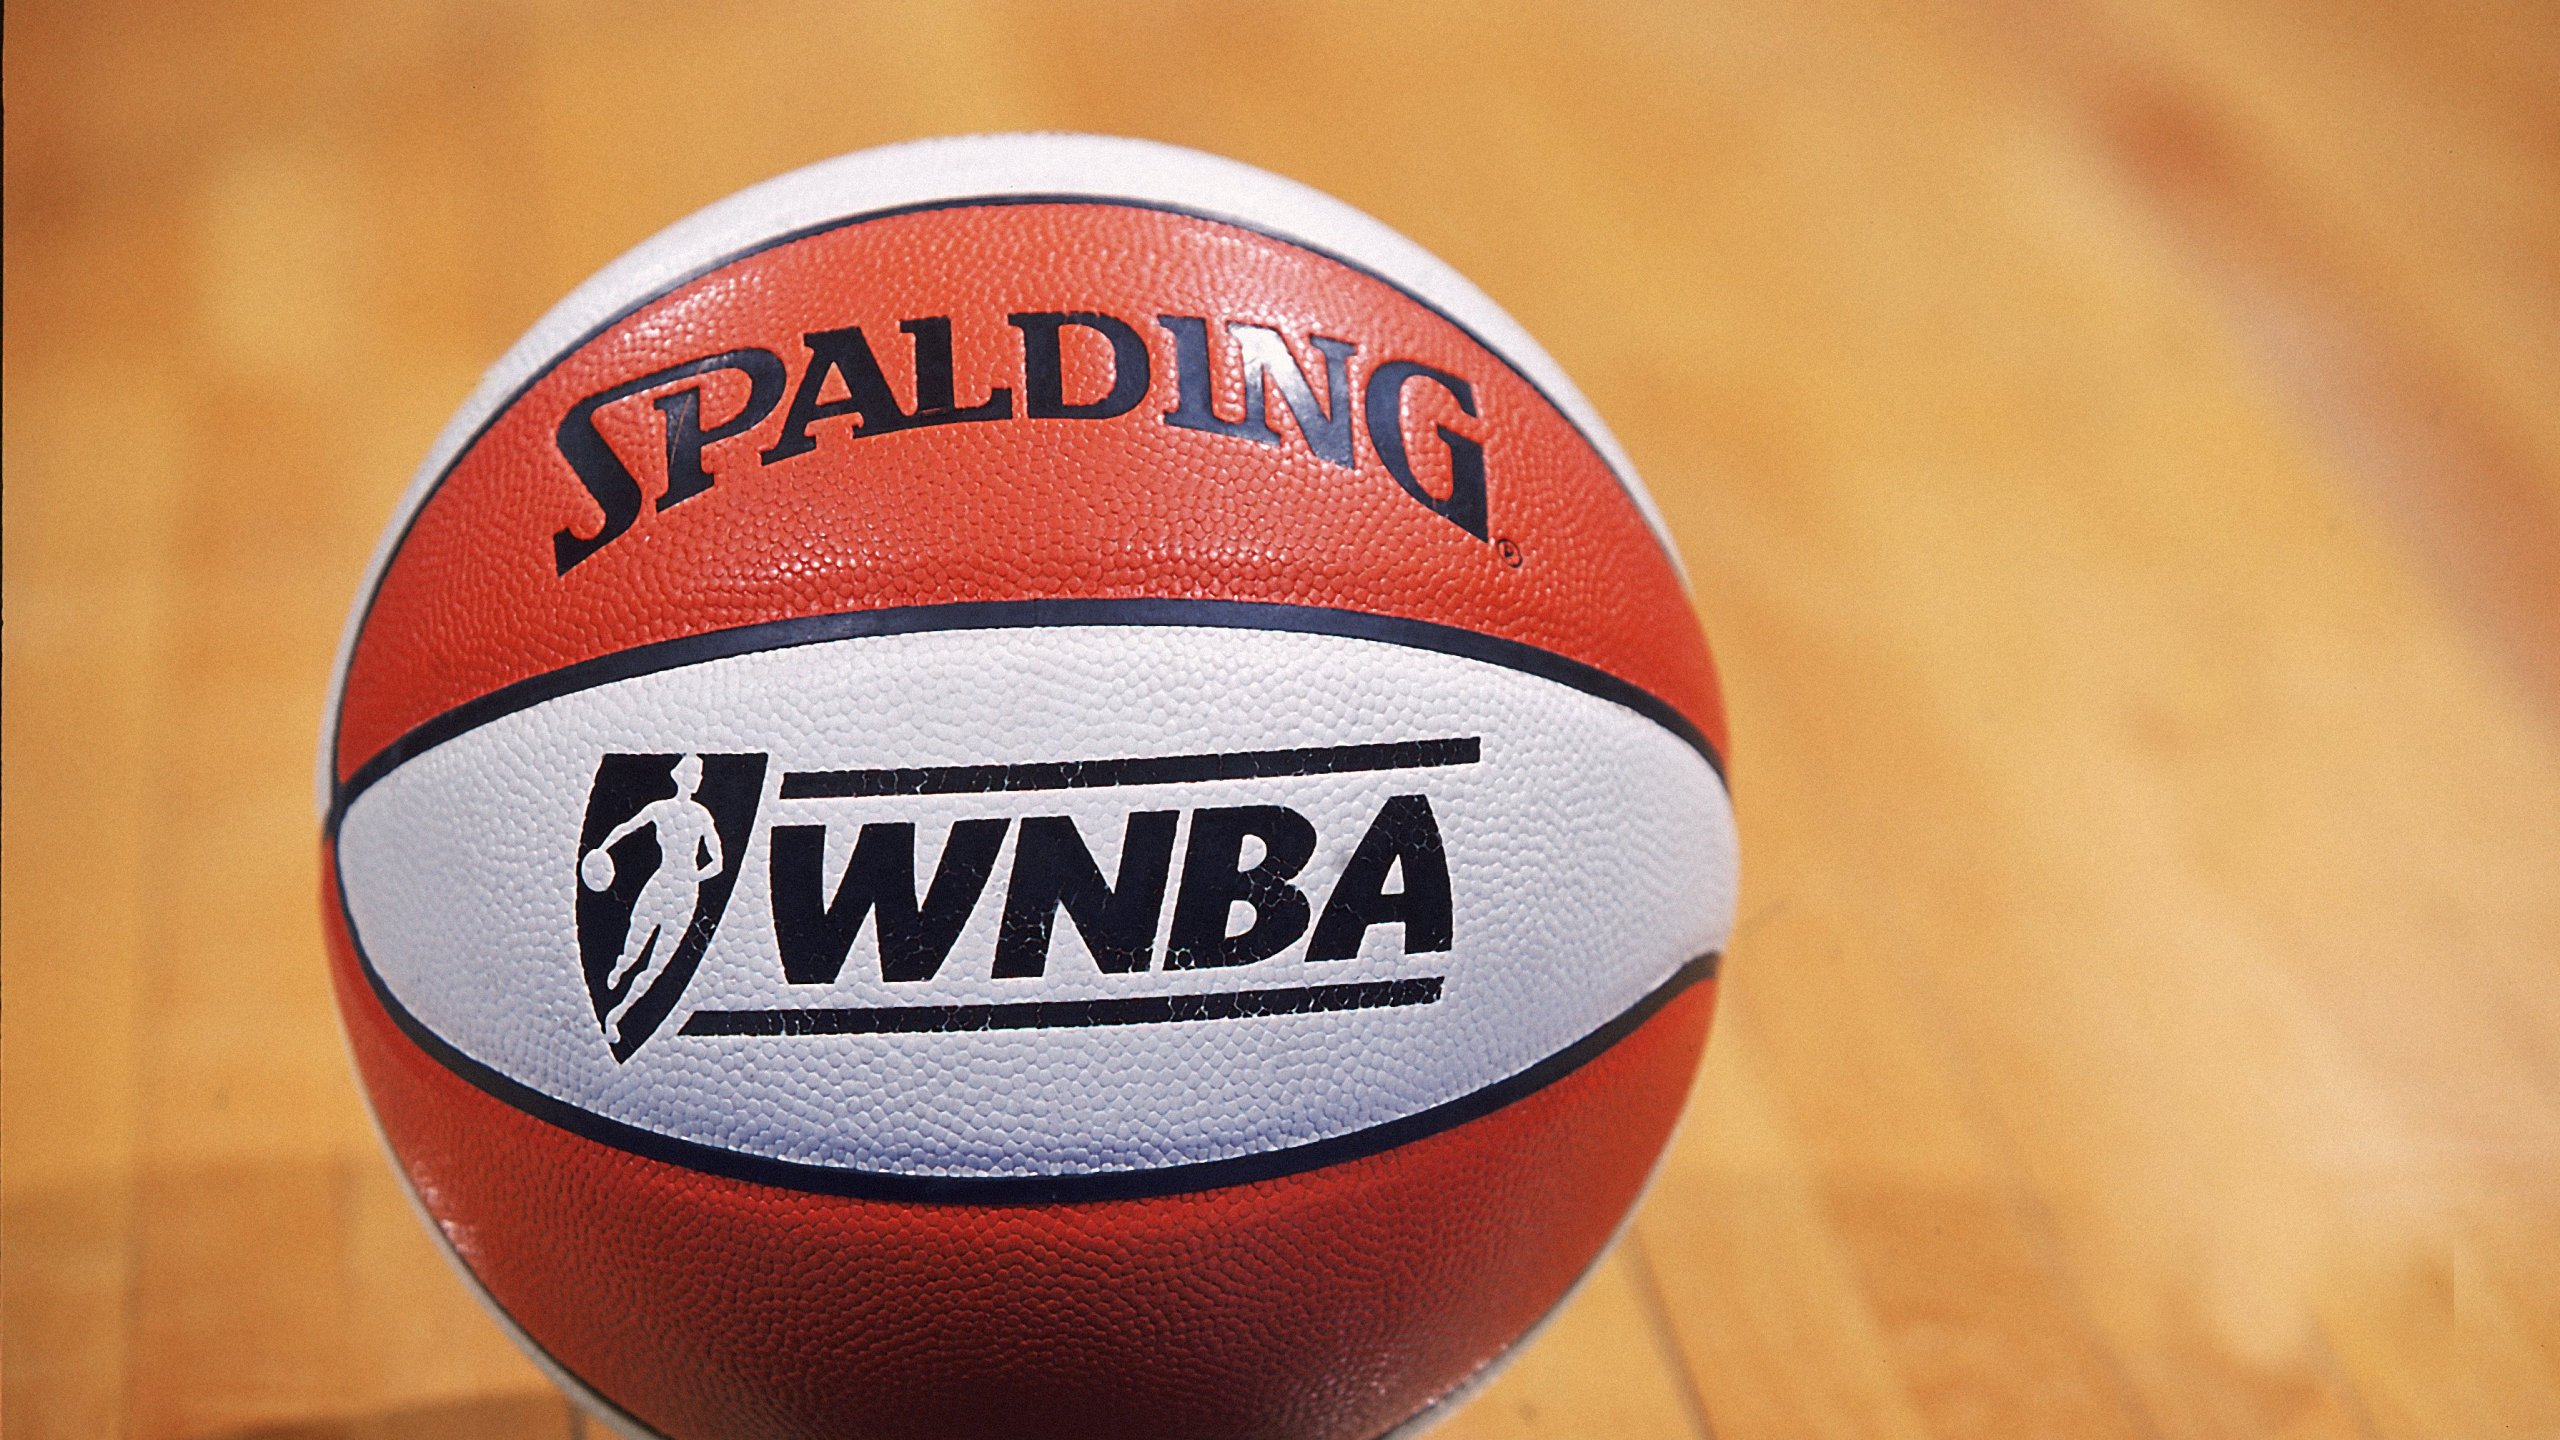 A shot of the WNBA basketball during the game between the Washington Mystics and the Sacramento Monarchs at the MCI Center in Washington, D.C. (Doug Pensinger / Allsport via AP)